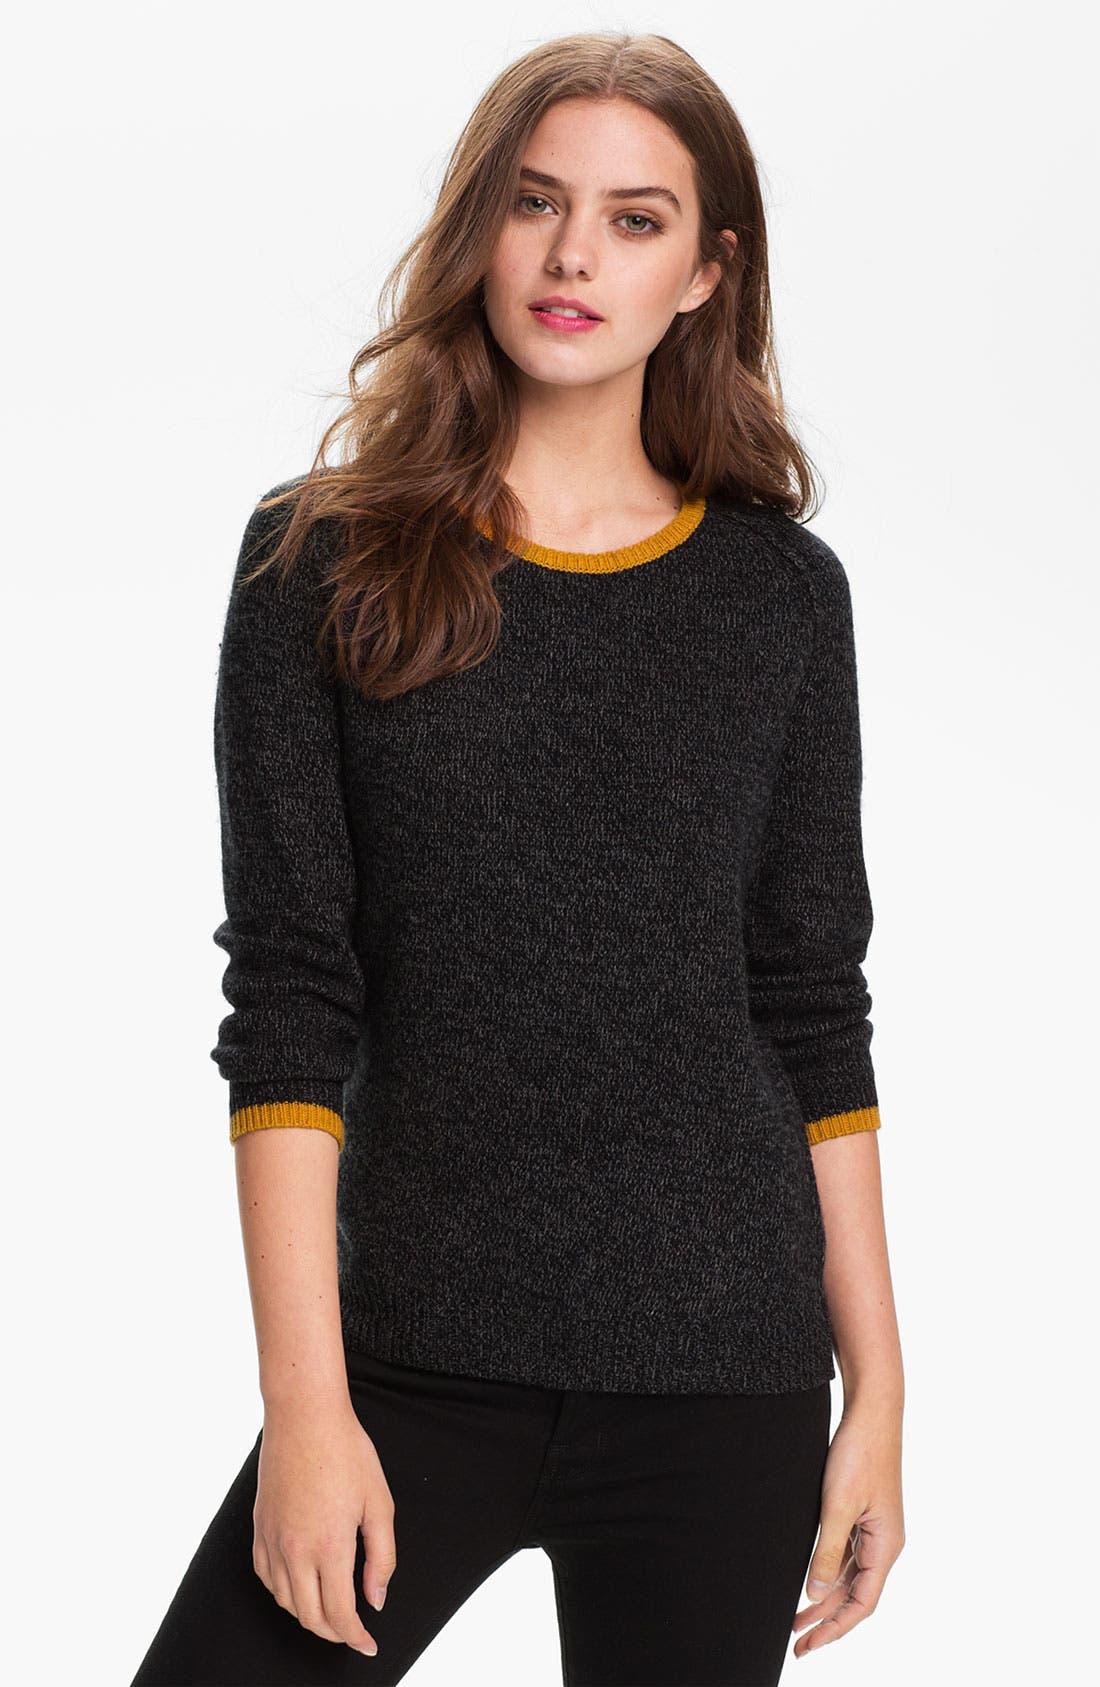 Alternate Image 1 Selected - Joie 'Moonlight' Sweater